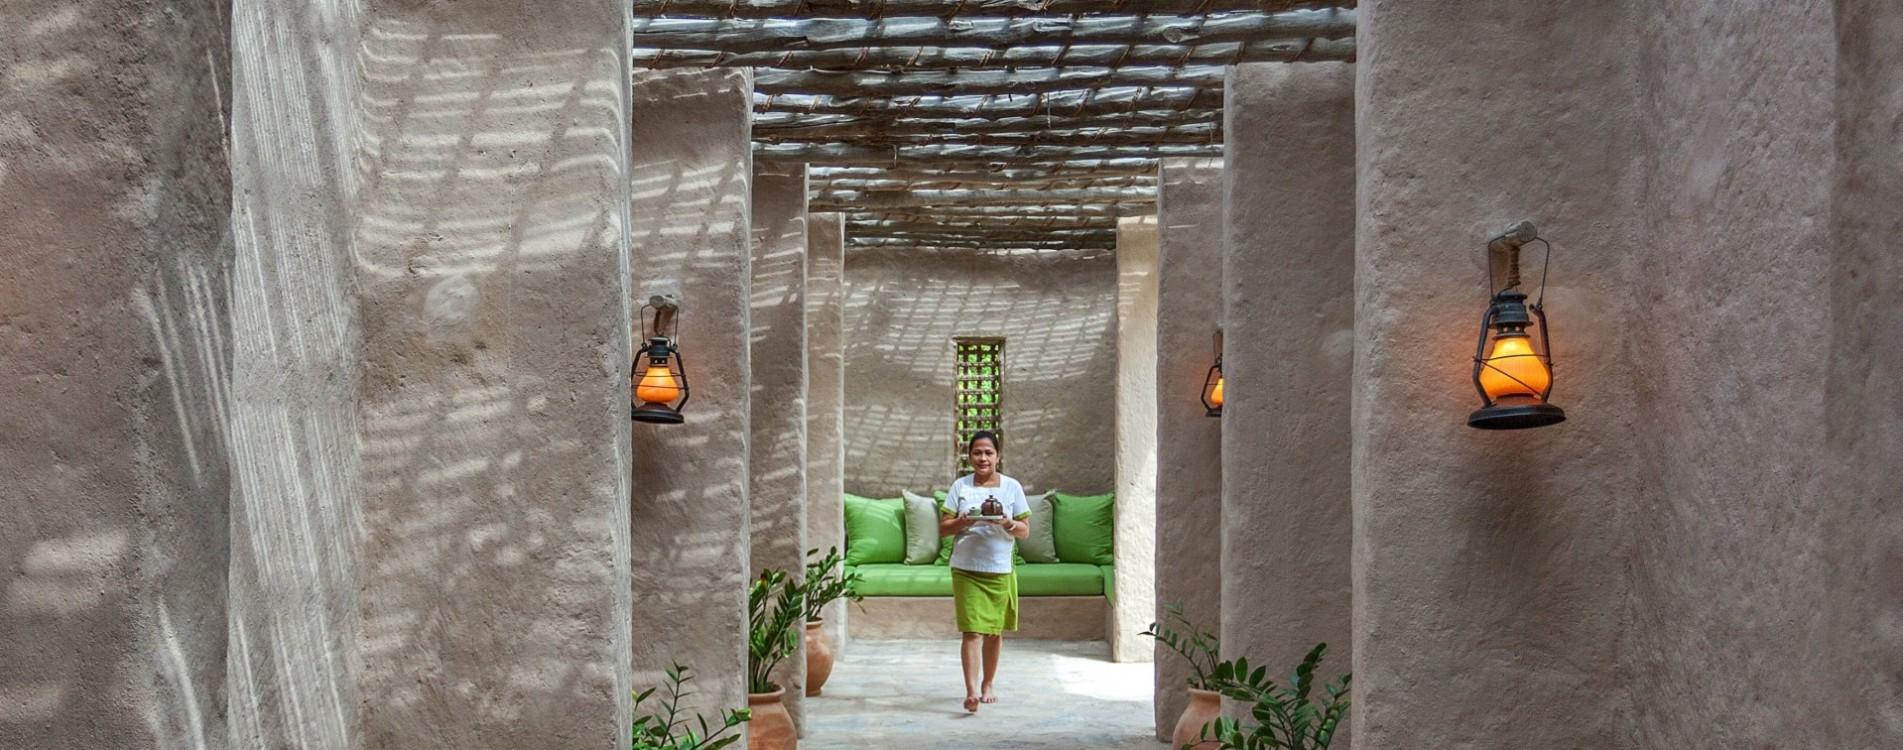 Six-Senses-Zighy-Bay-Spa-Eingang-Flur-Oman.jpg